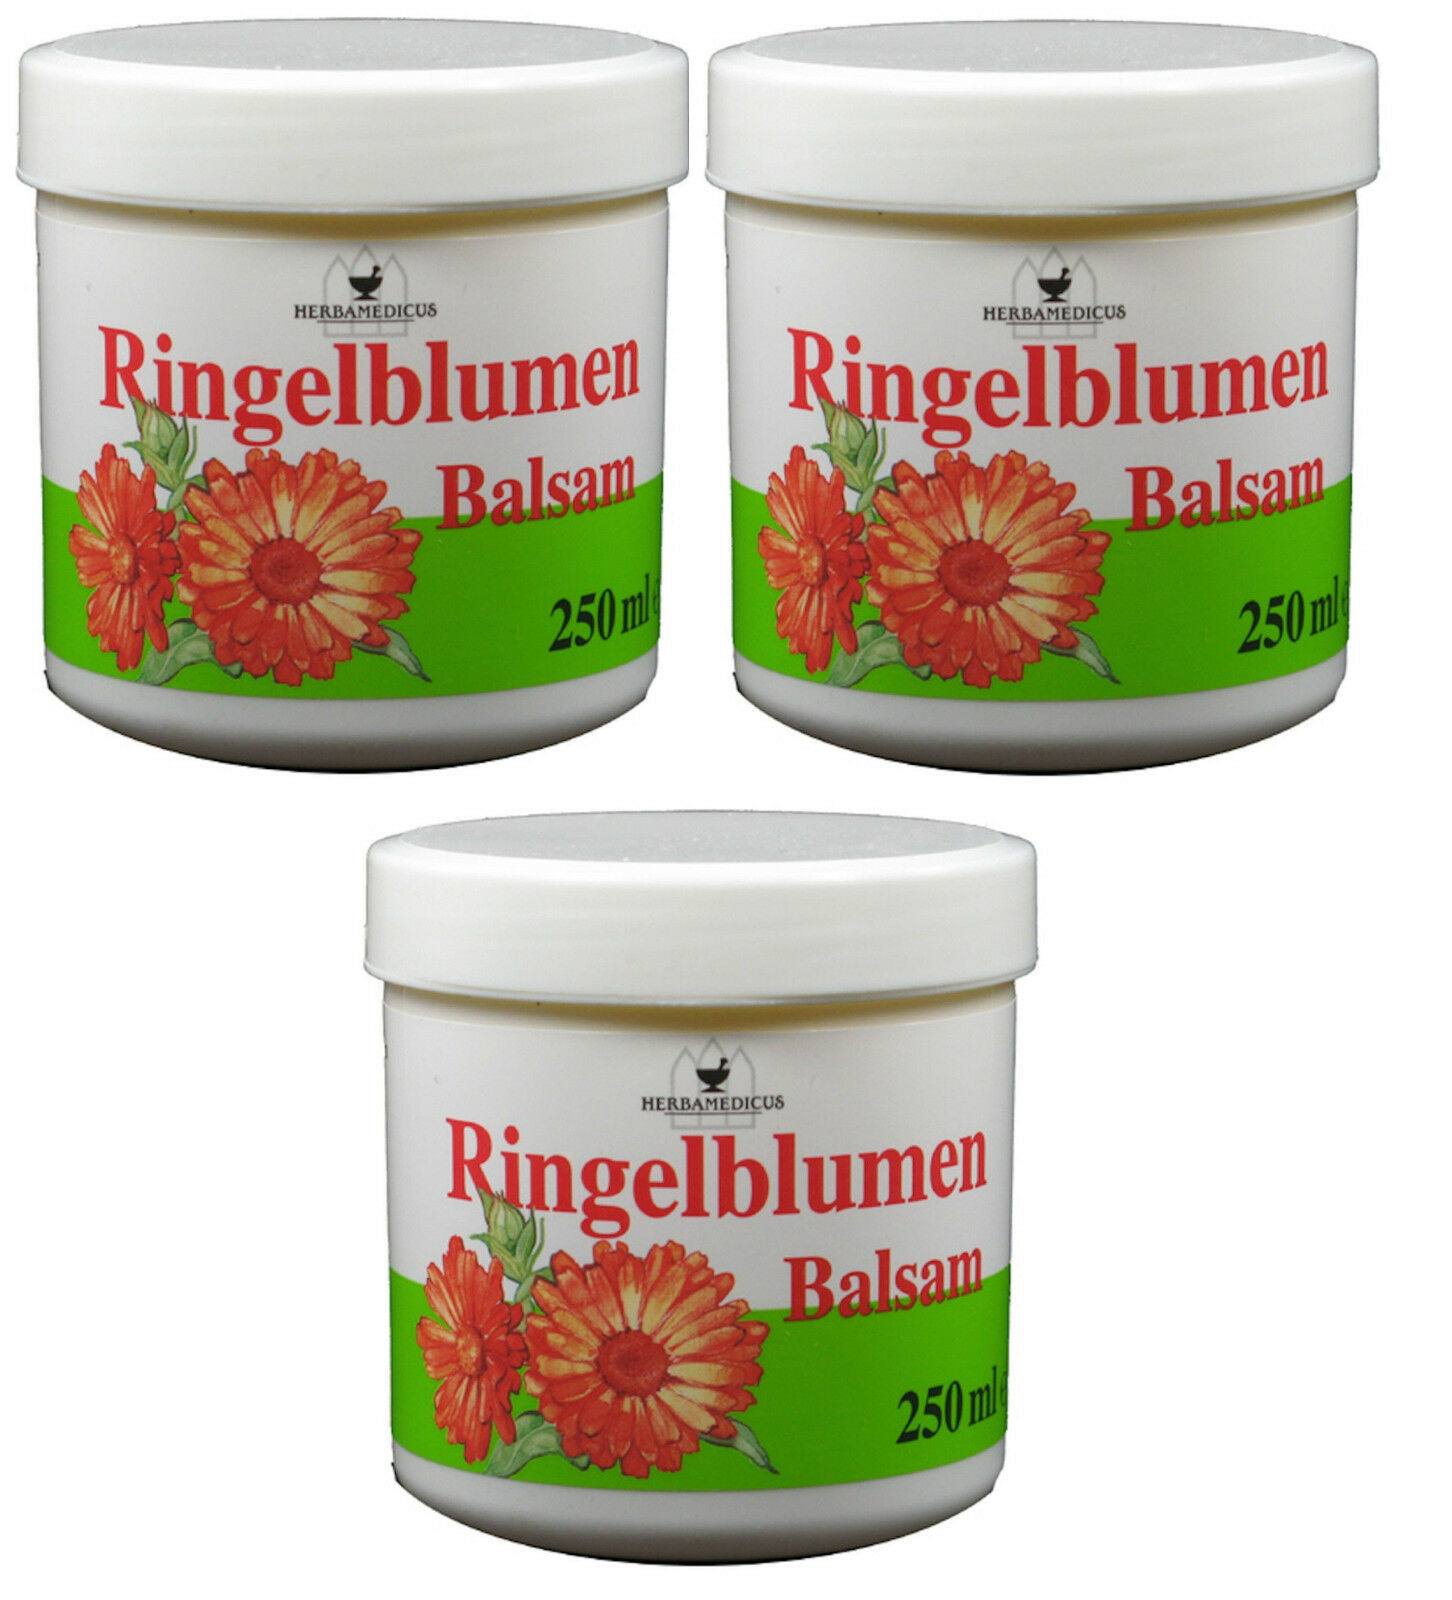 Ringelblumen Creme 3x 250ml Pflegecreme Balsam Hautpflege Handcreme Lippencreme